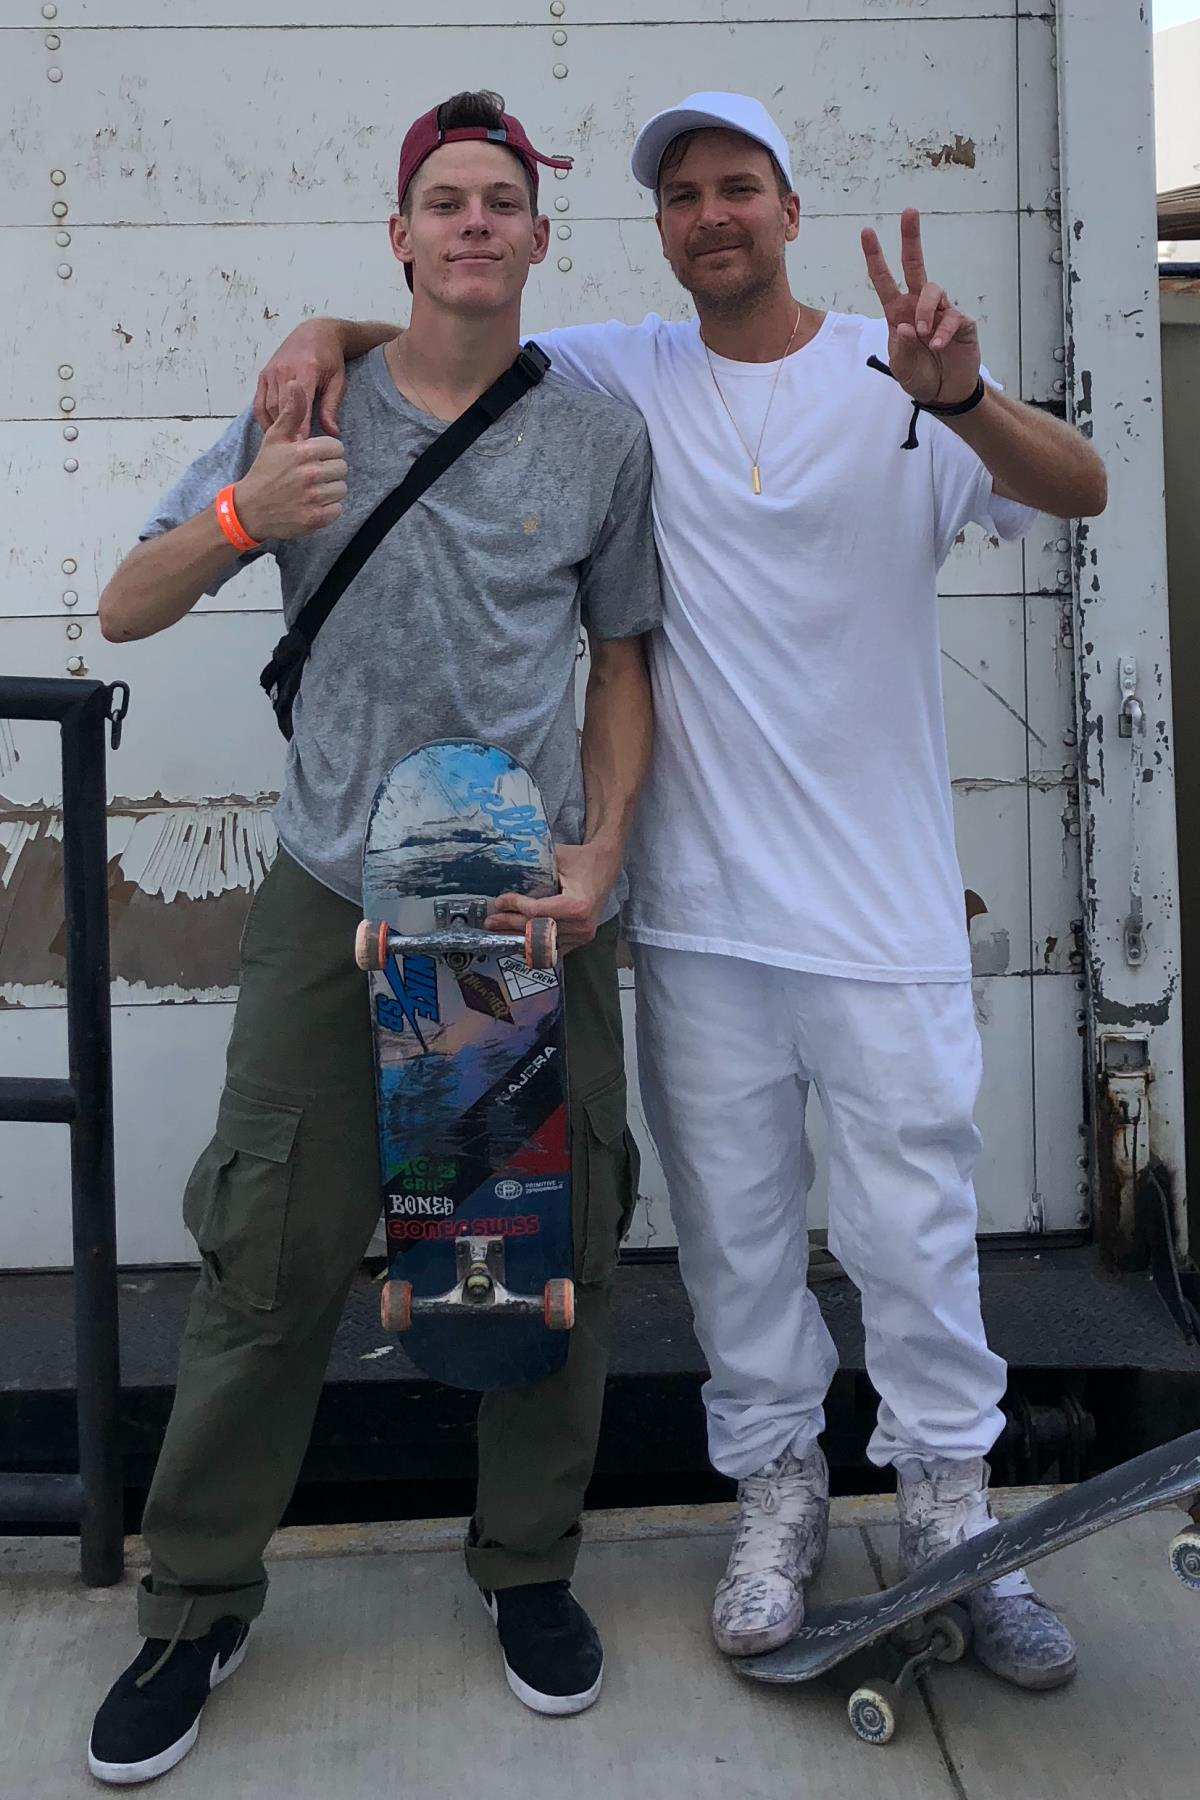 Jake and Muska